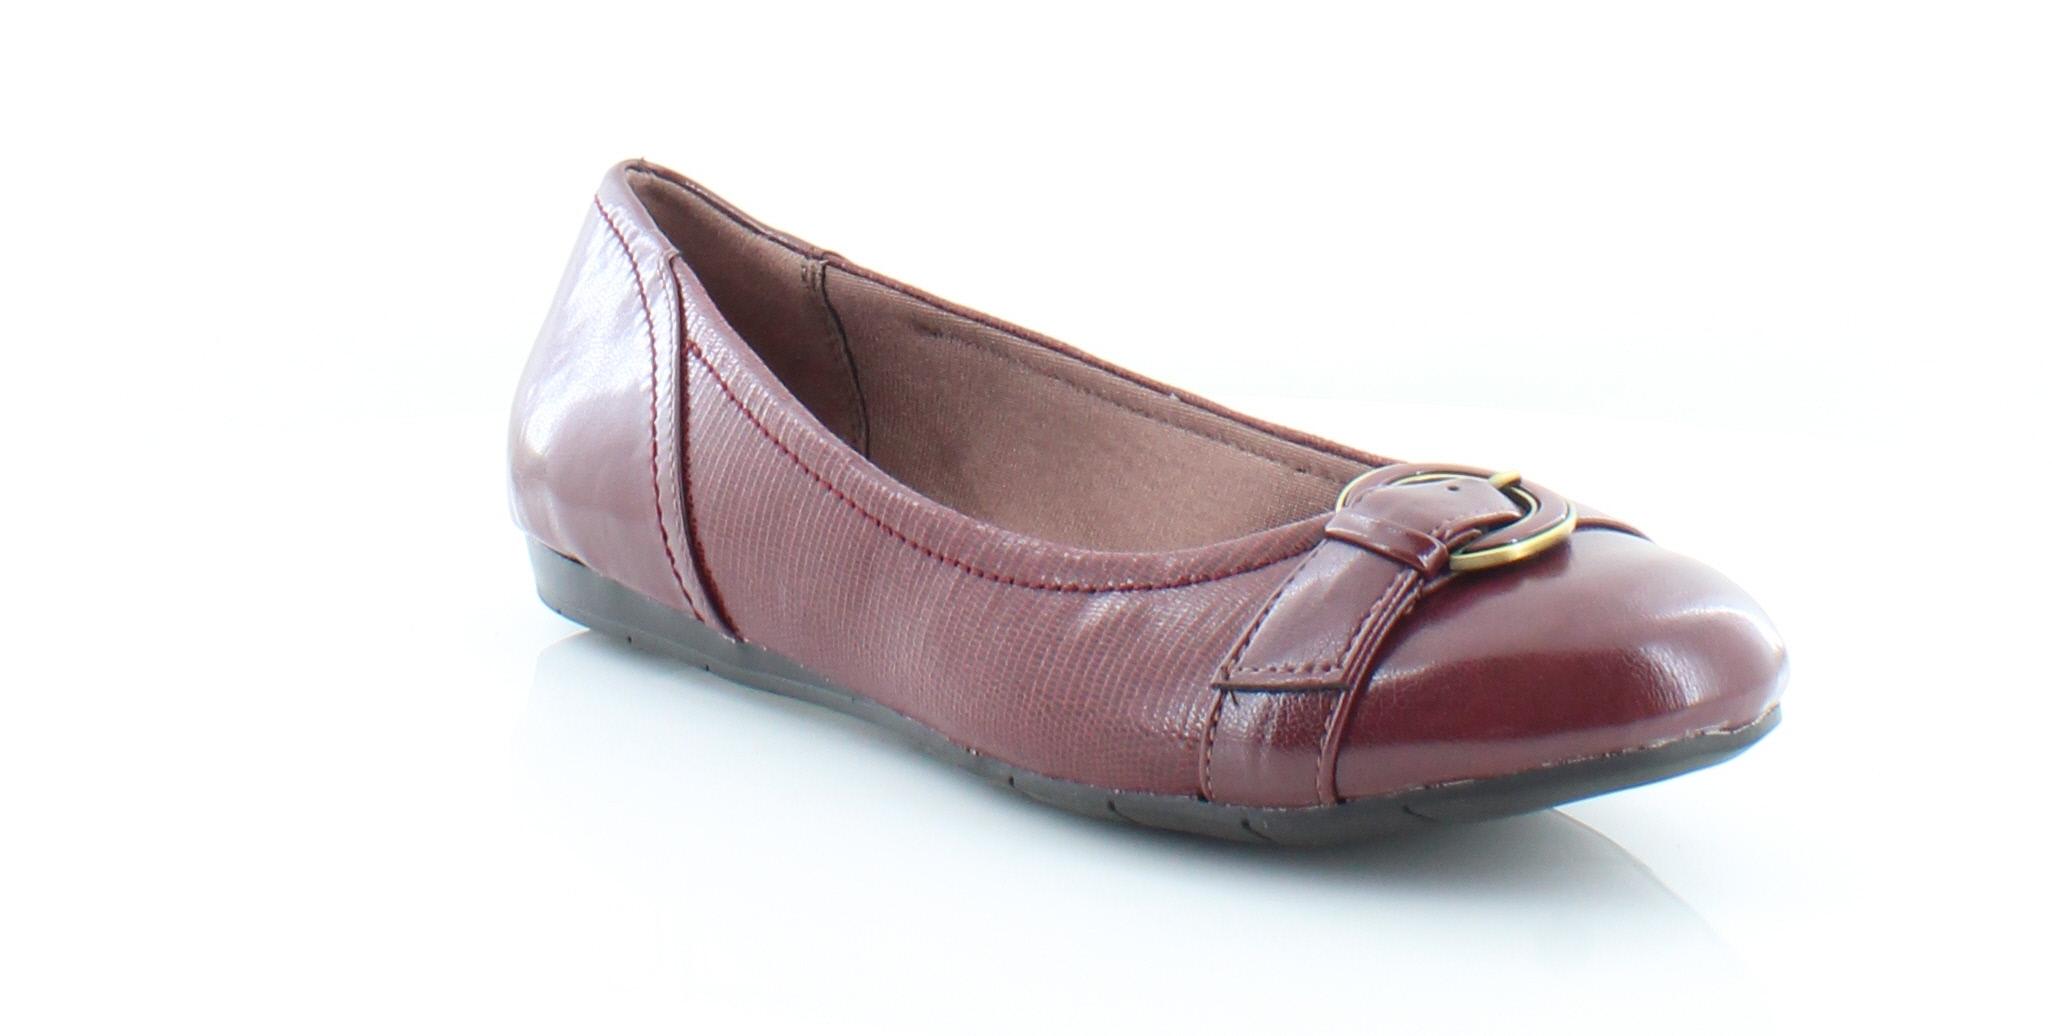 Lifestride Nero Women's Flats & Oxfords by